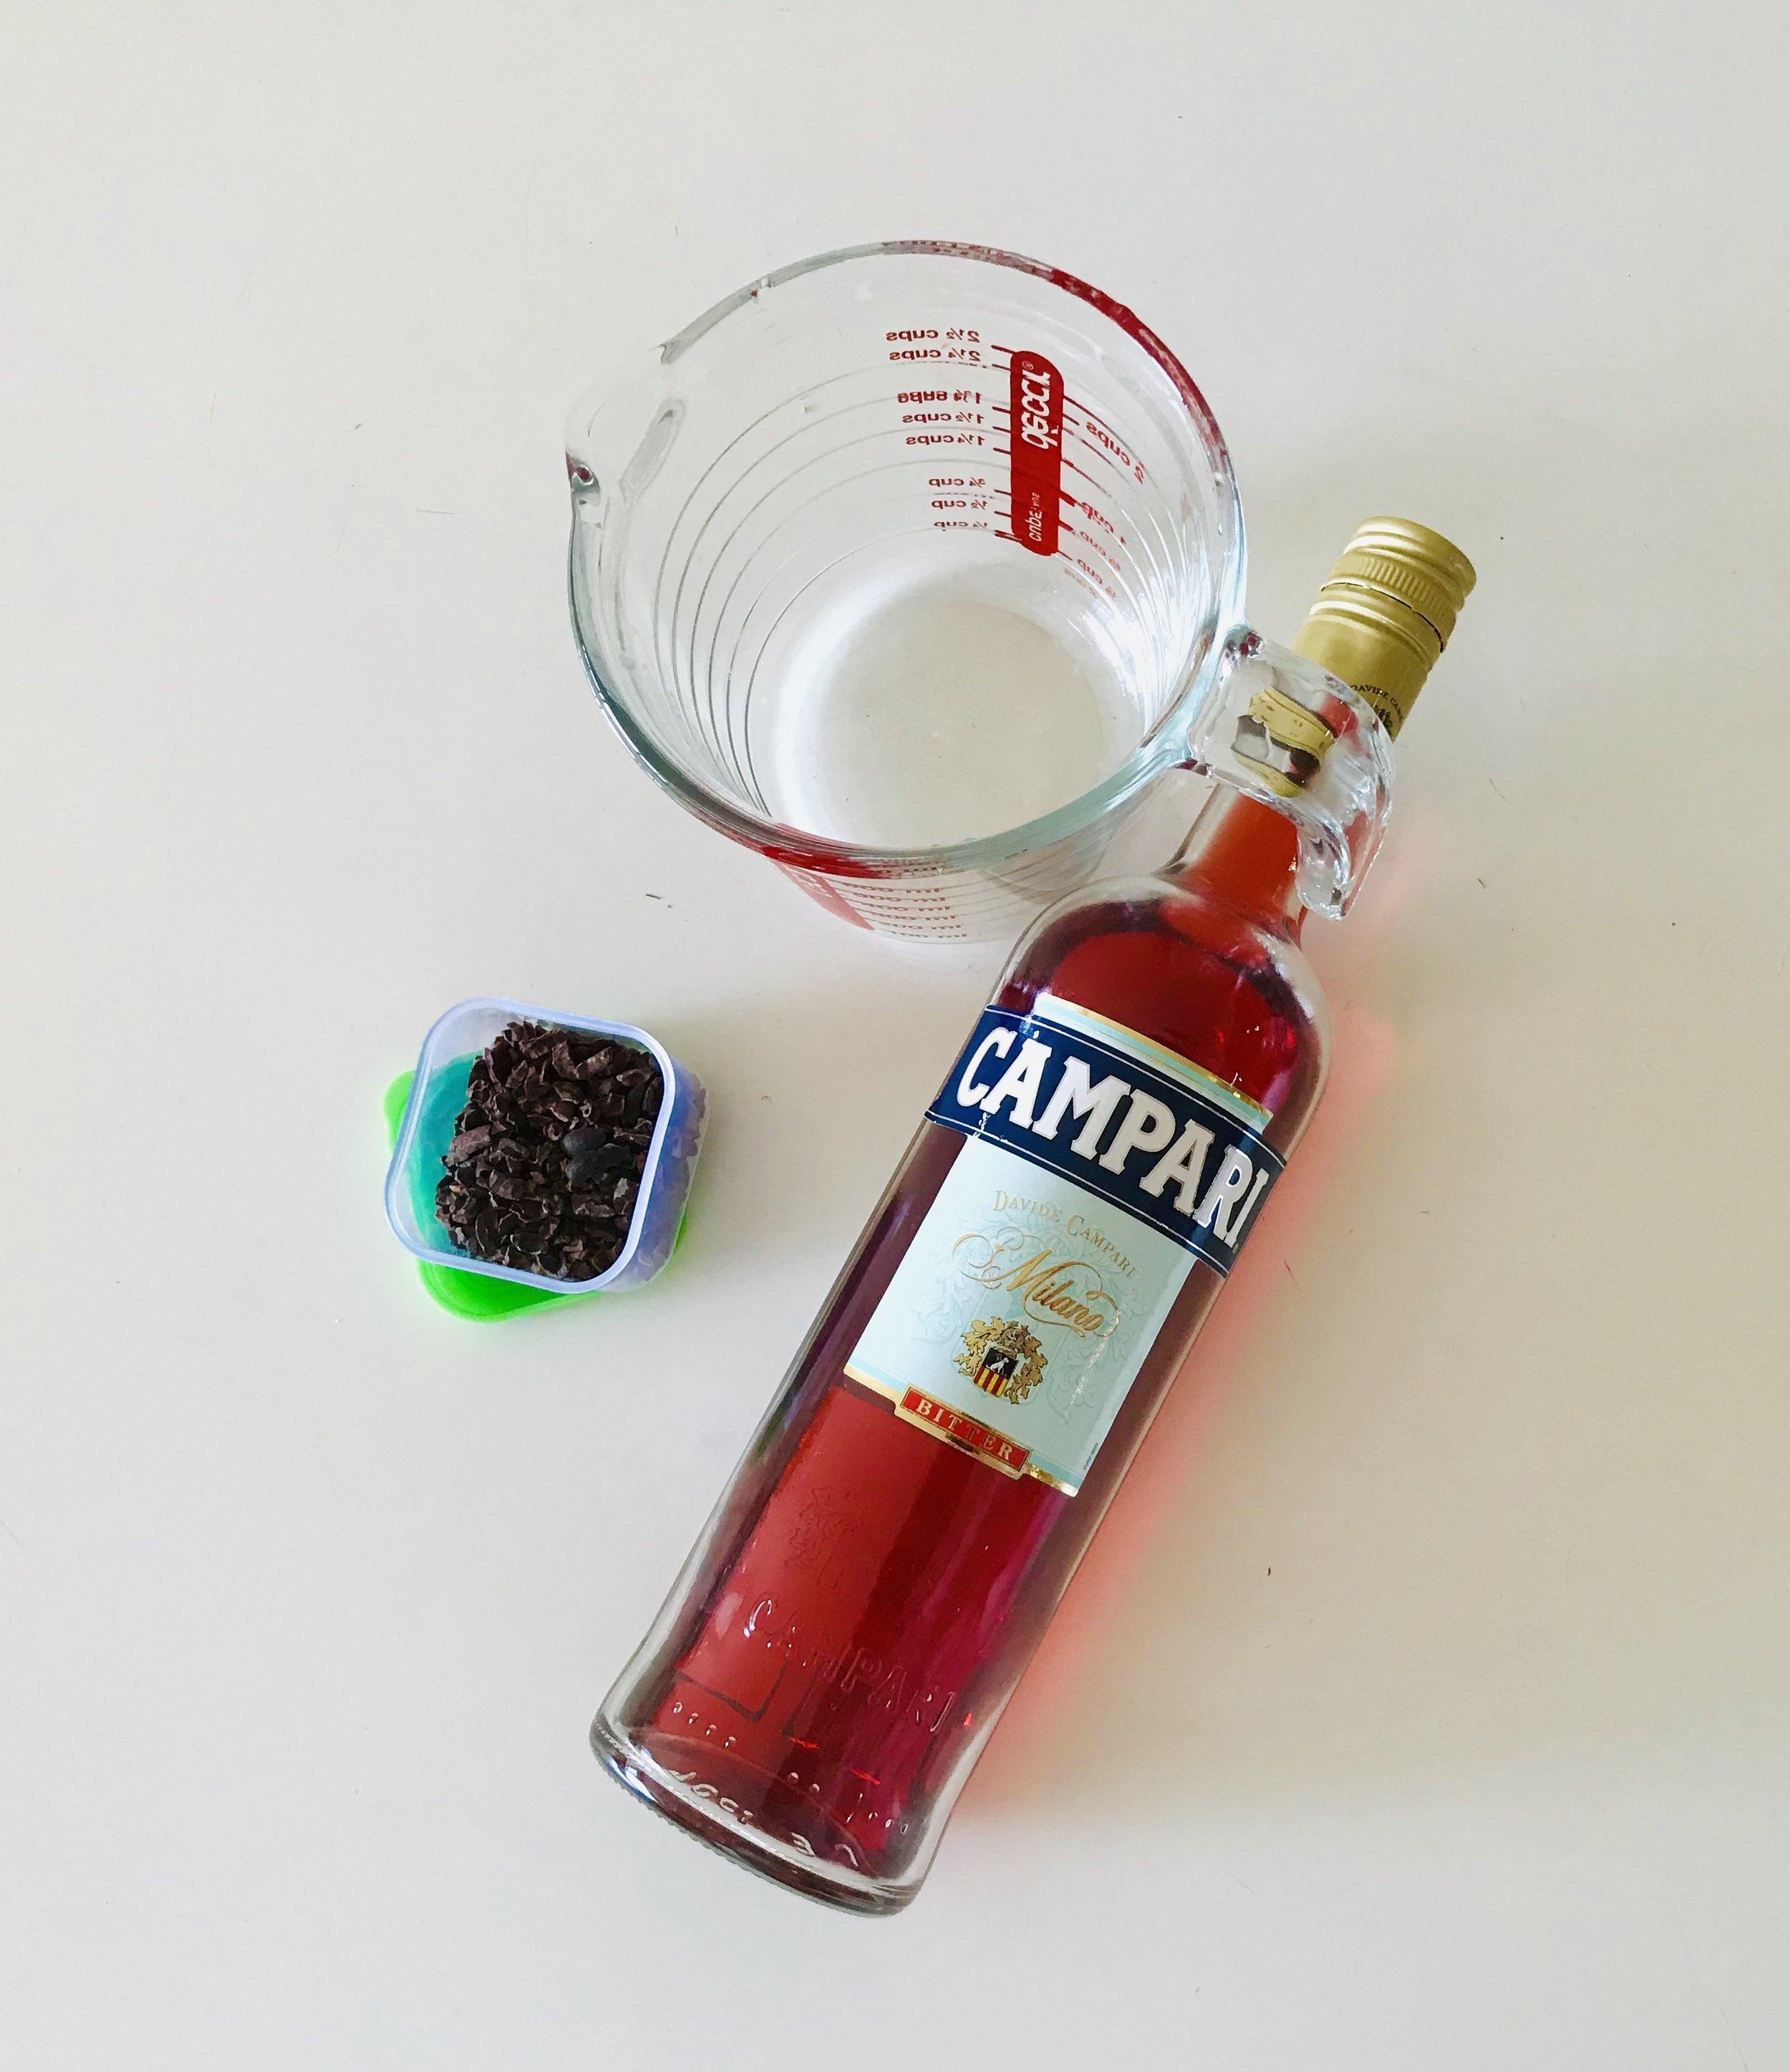 Cocoa nib infused Campari - here's what you'll need